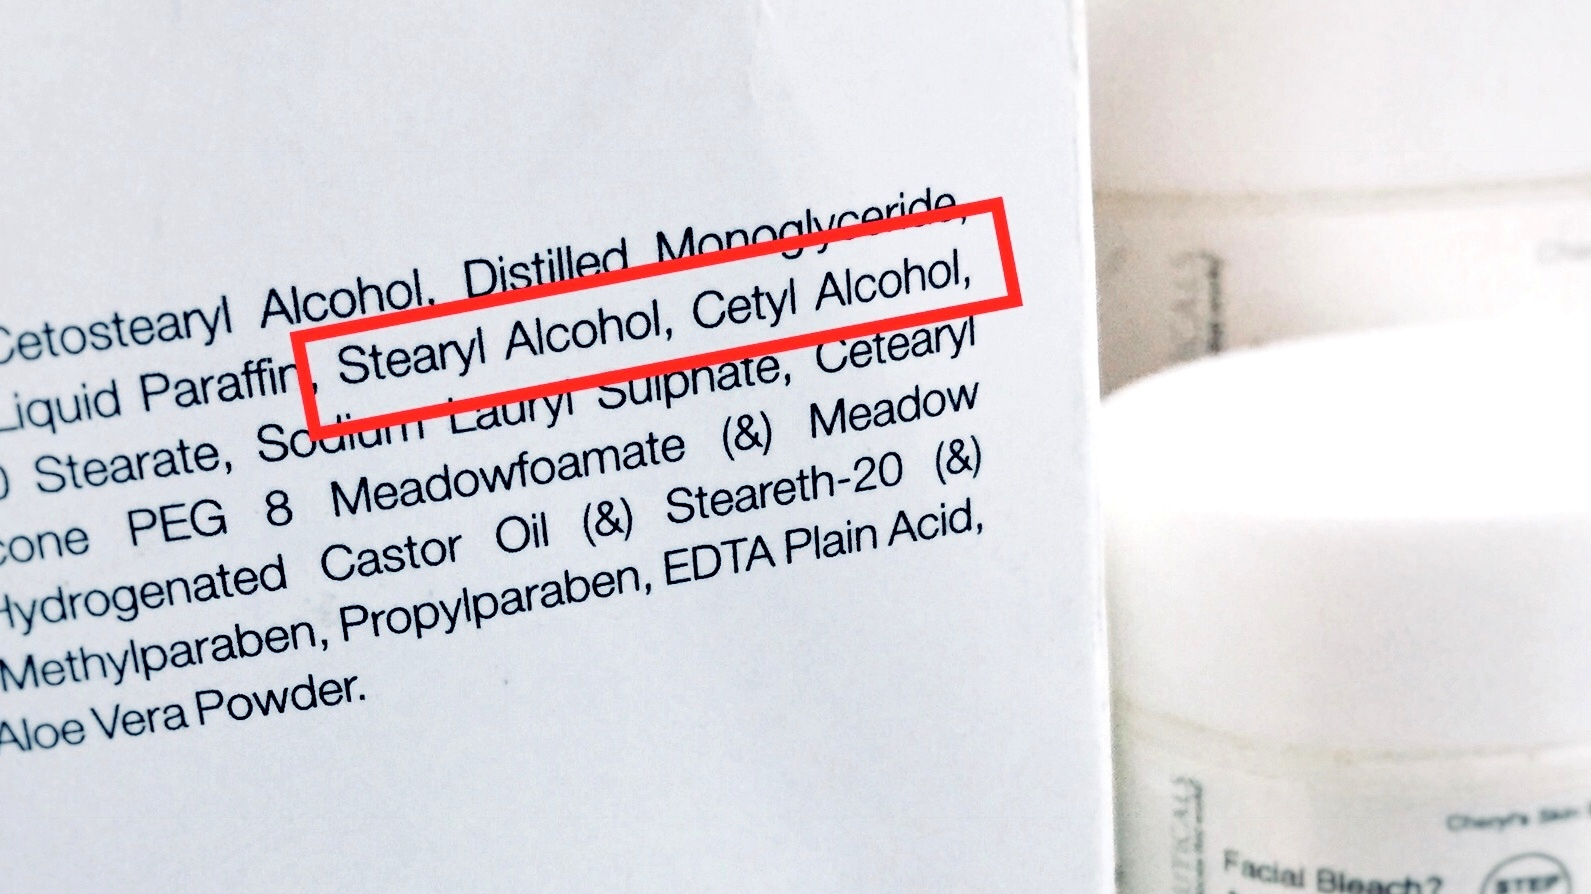 alcohol-con-trong-my-pham-va-nhung-luu-y-e